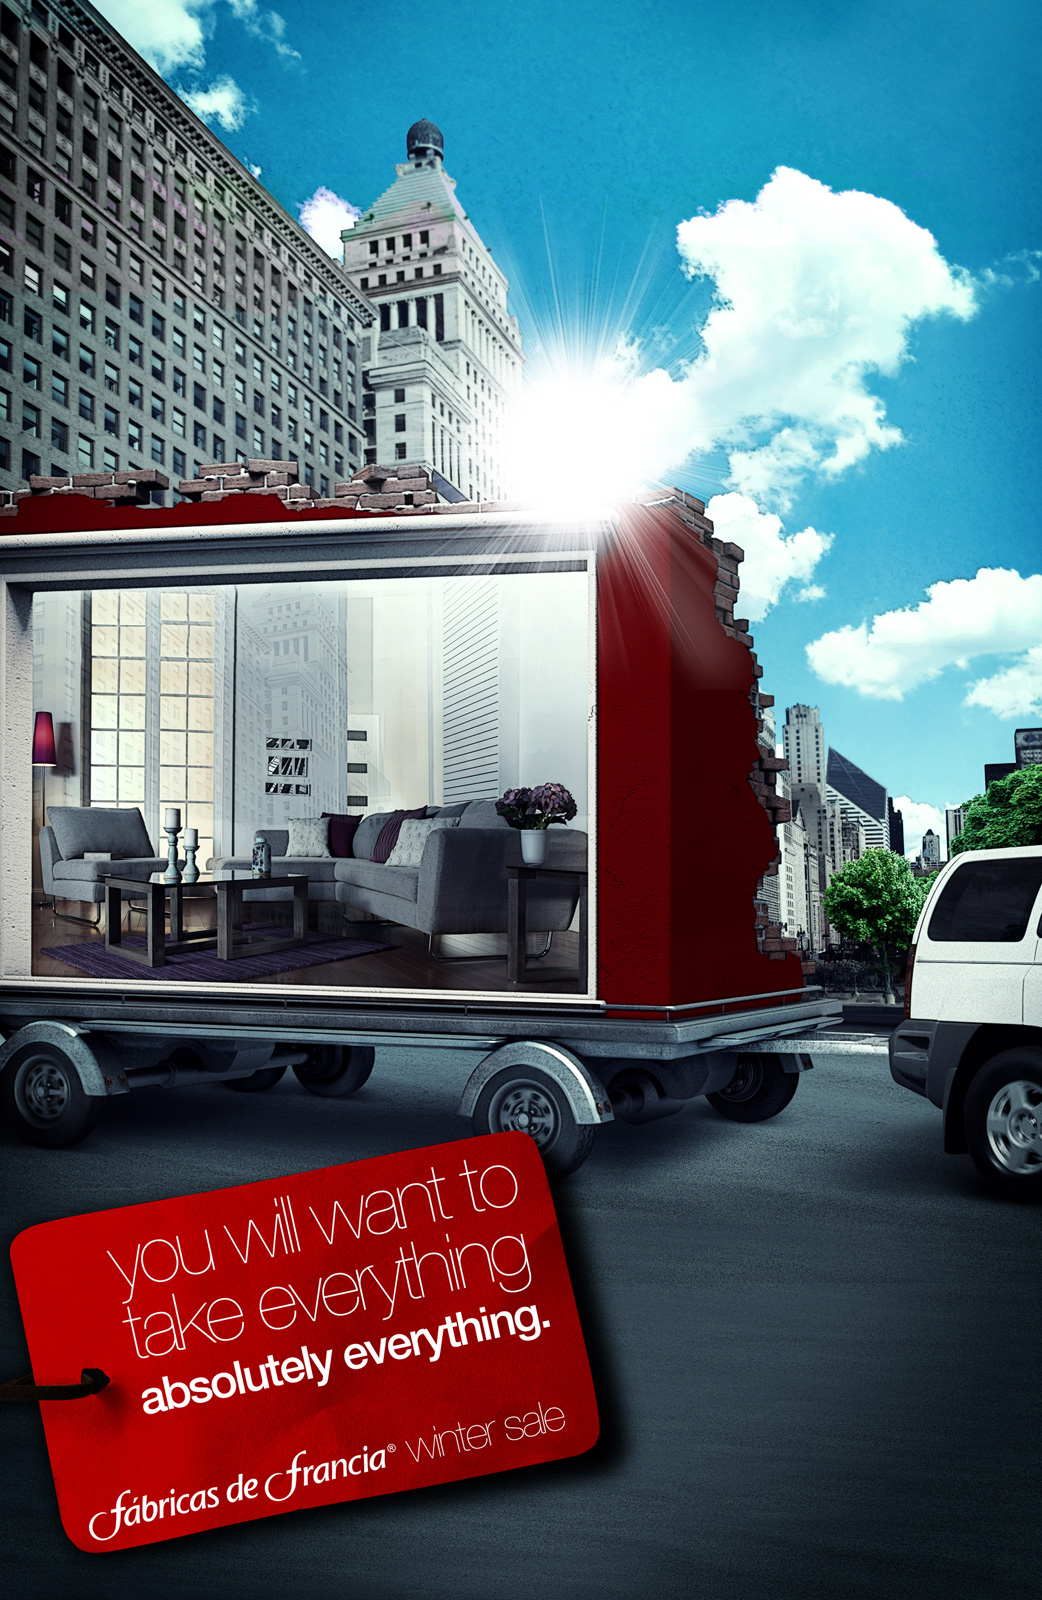 Compartiendo Publicidad: Bonus für bet at home bet at home Seite nicht erreichbar ist bet at home mobilen Bonuscode Fábricas de Francia (México)